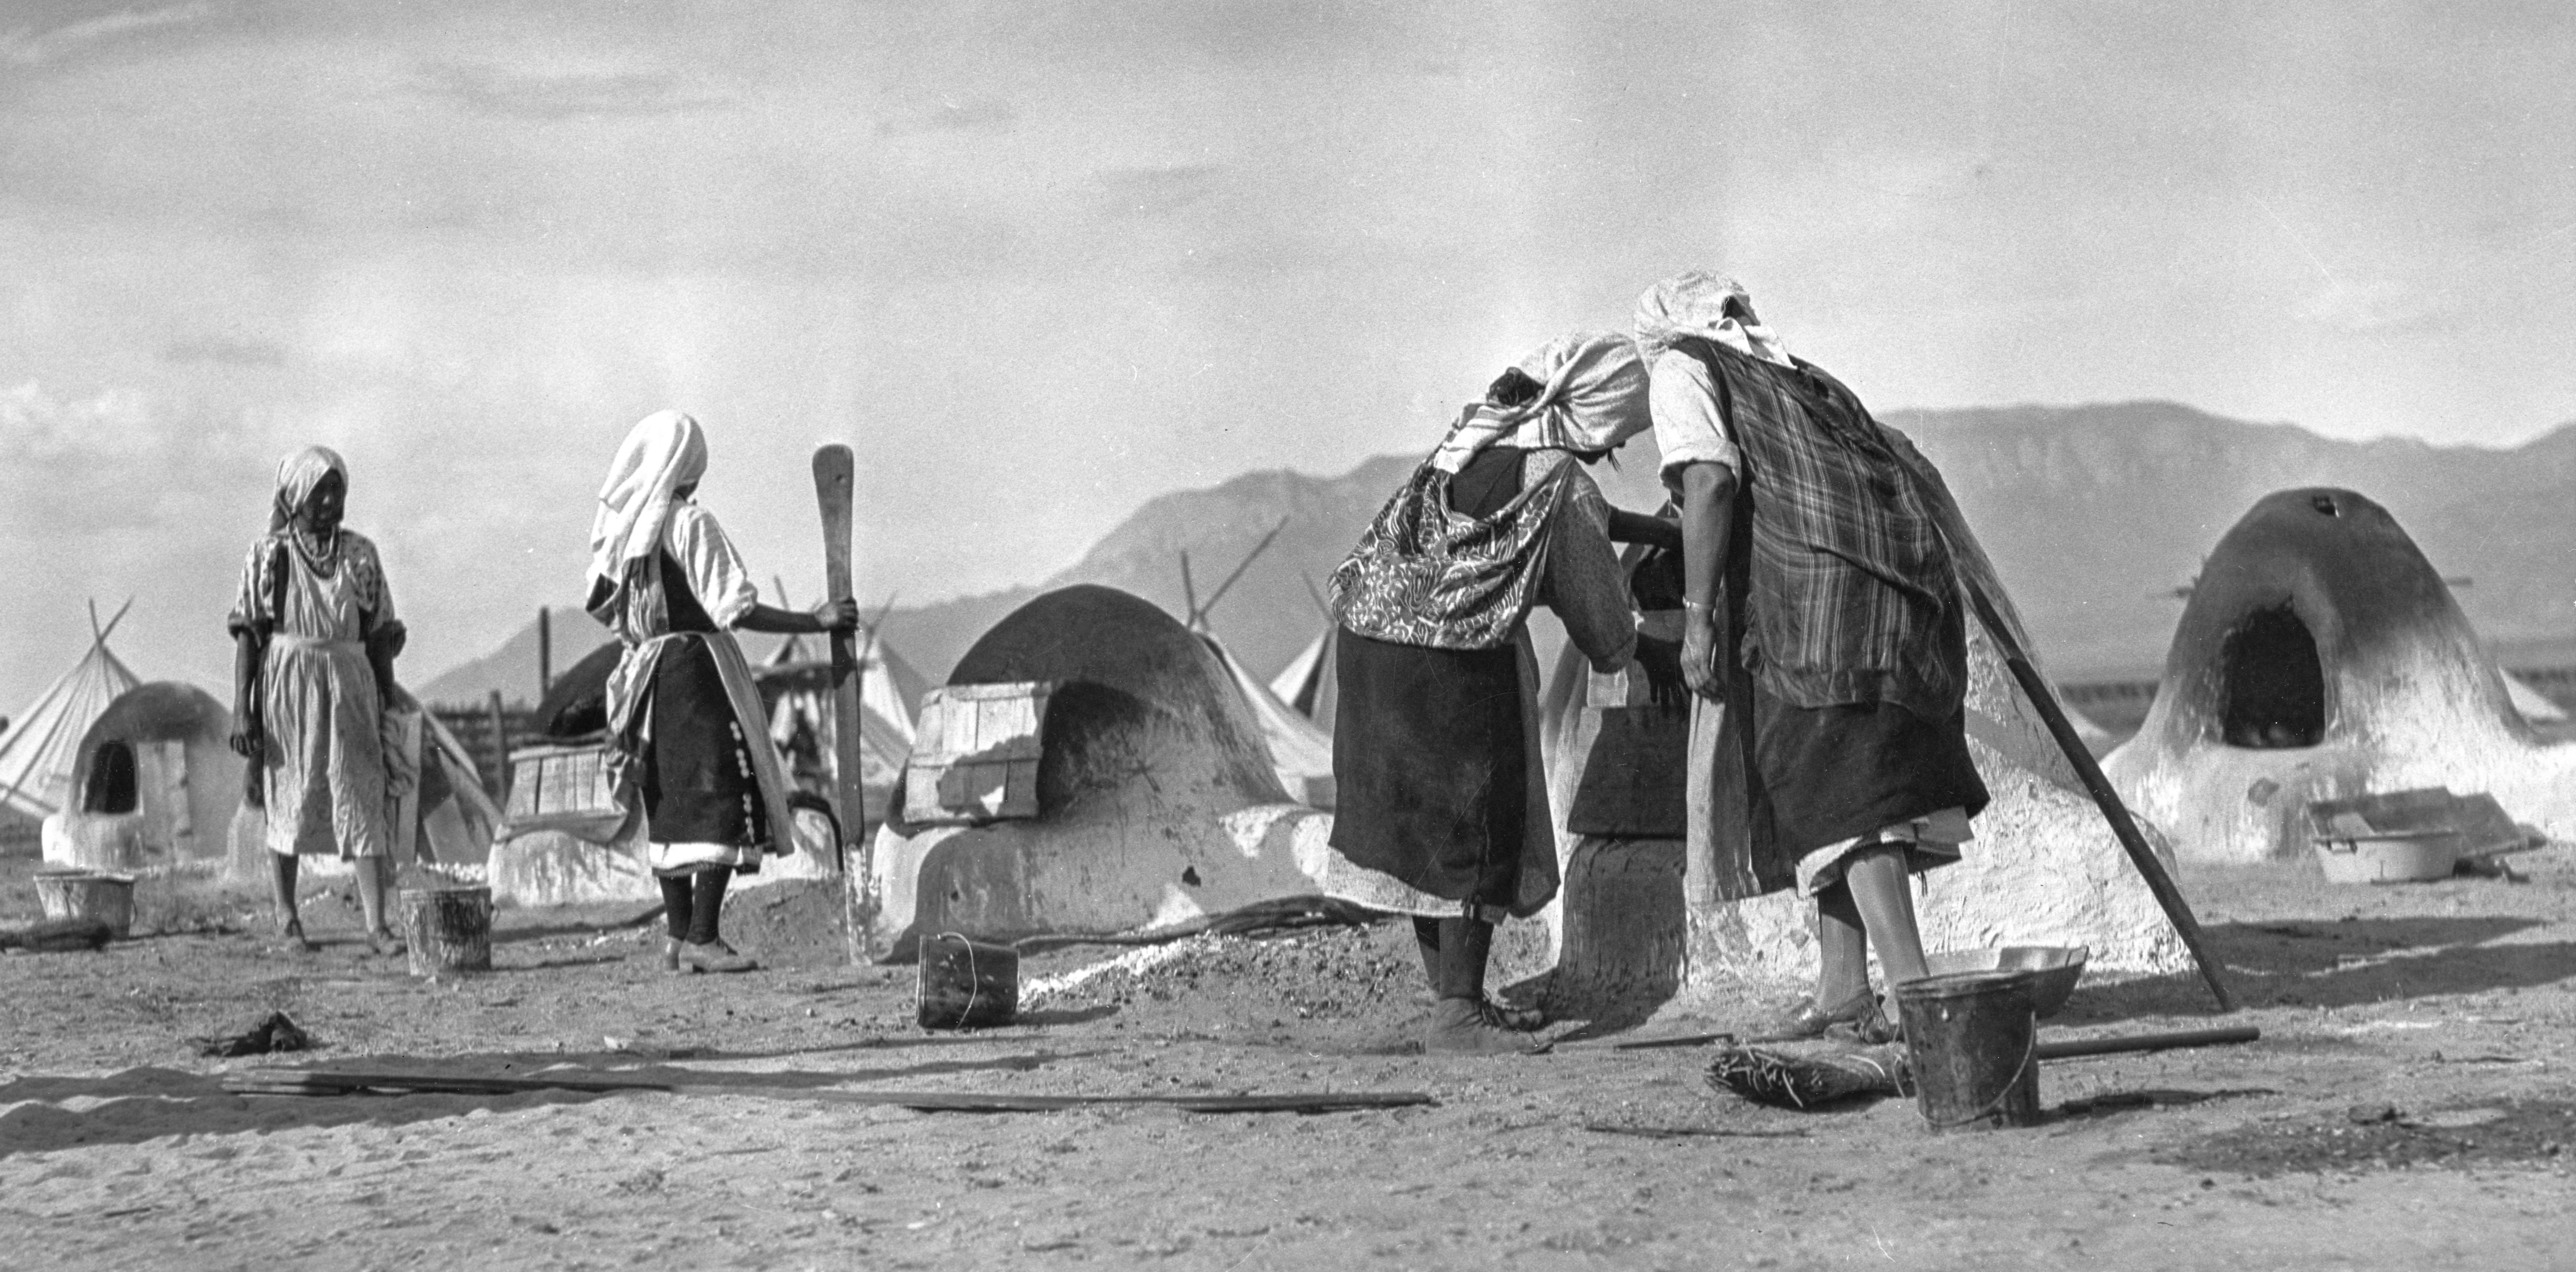 Hanna & Hanna, Women working with hornos, ca. 1930